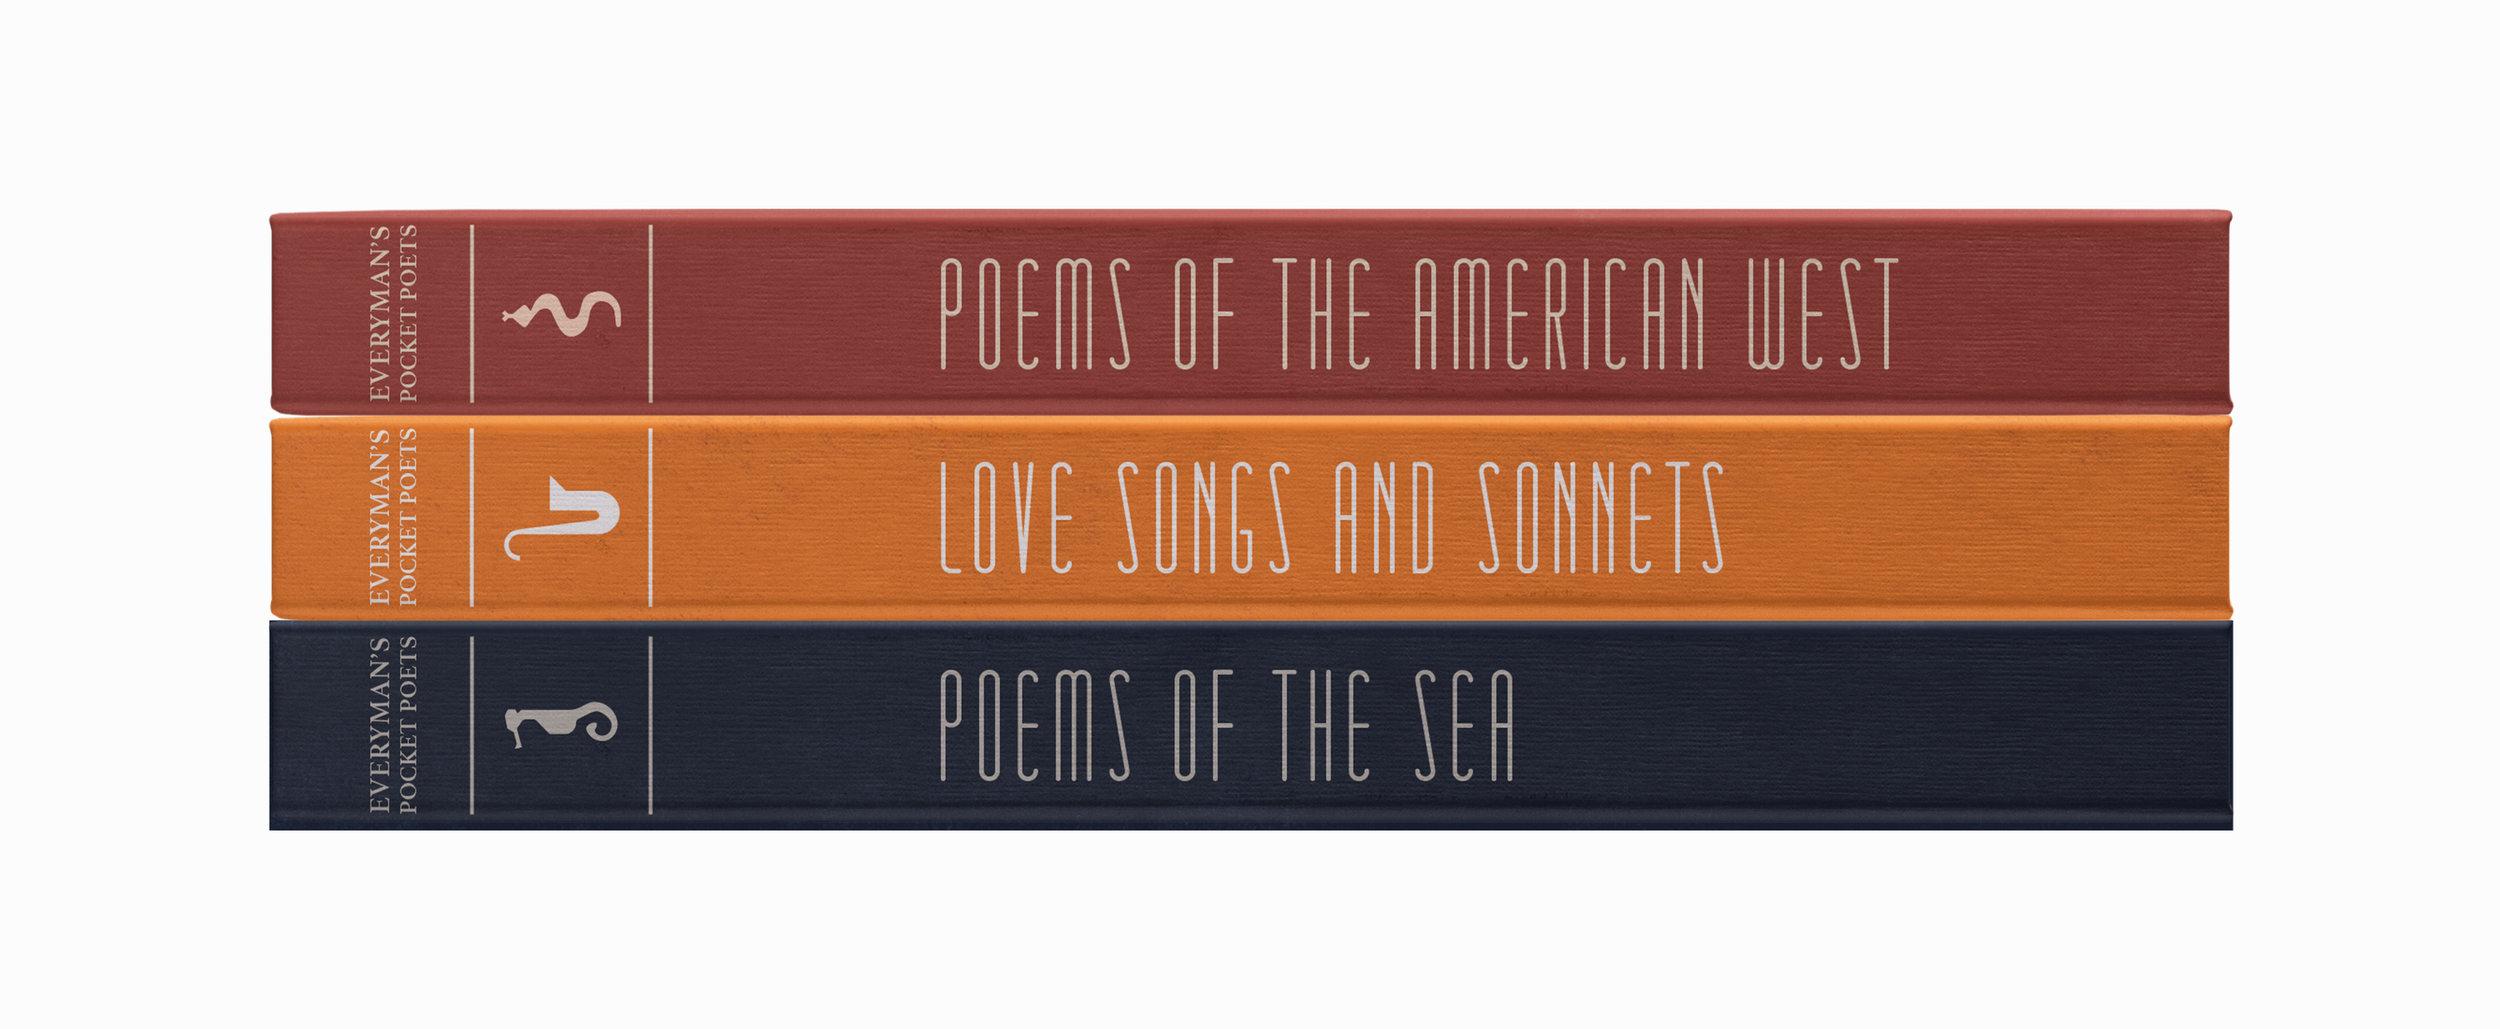 Everman's_Pocket_Poet_Spine_Narrow.jpg